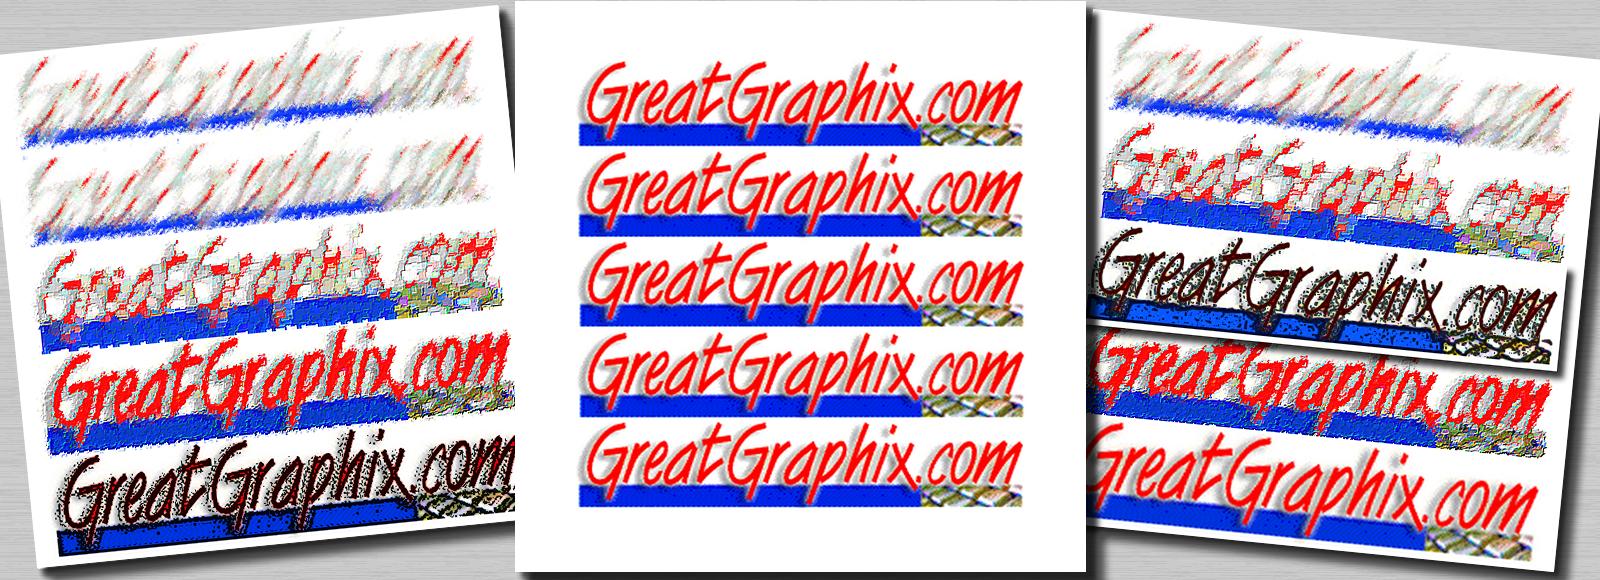 greatgraphix_slider-image_working-on-it-3_1600x600